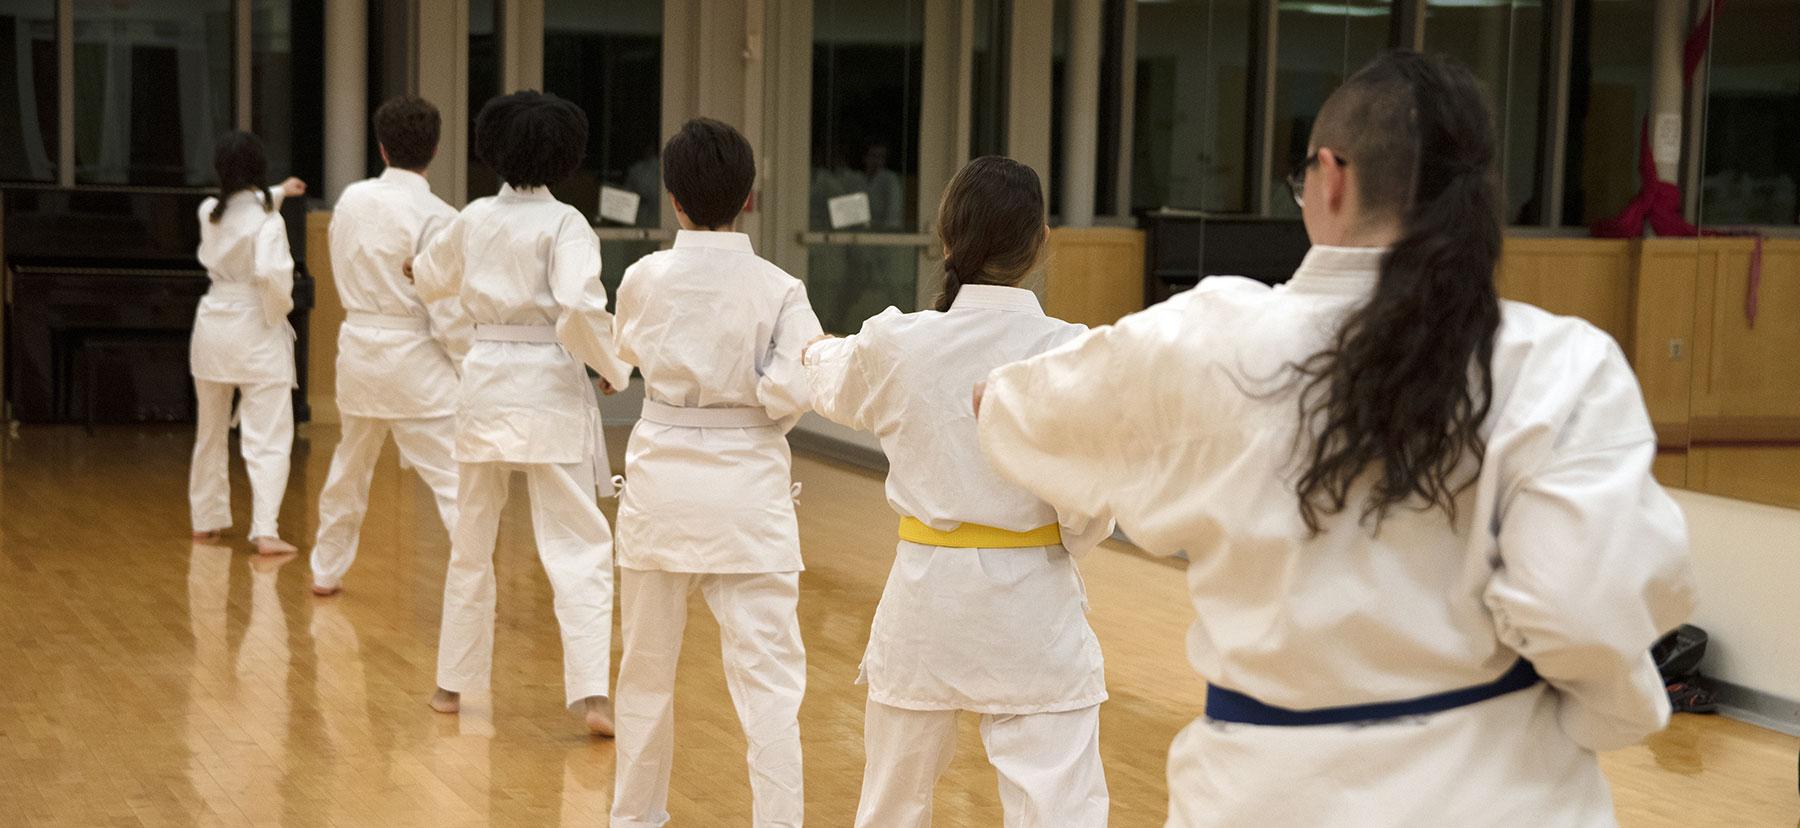 Students practicing Shotokan Karate